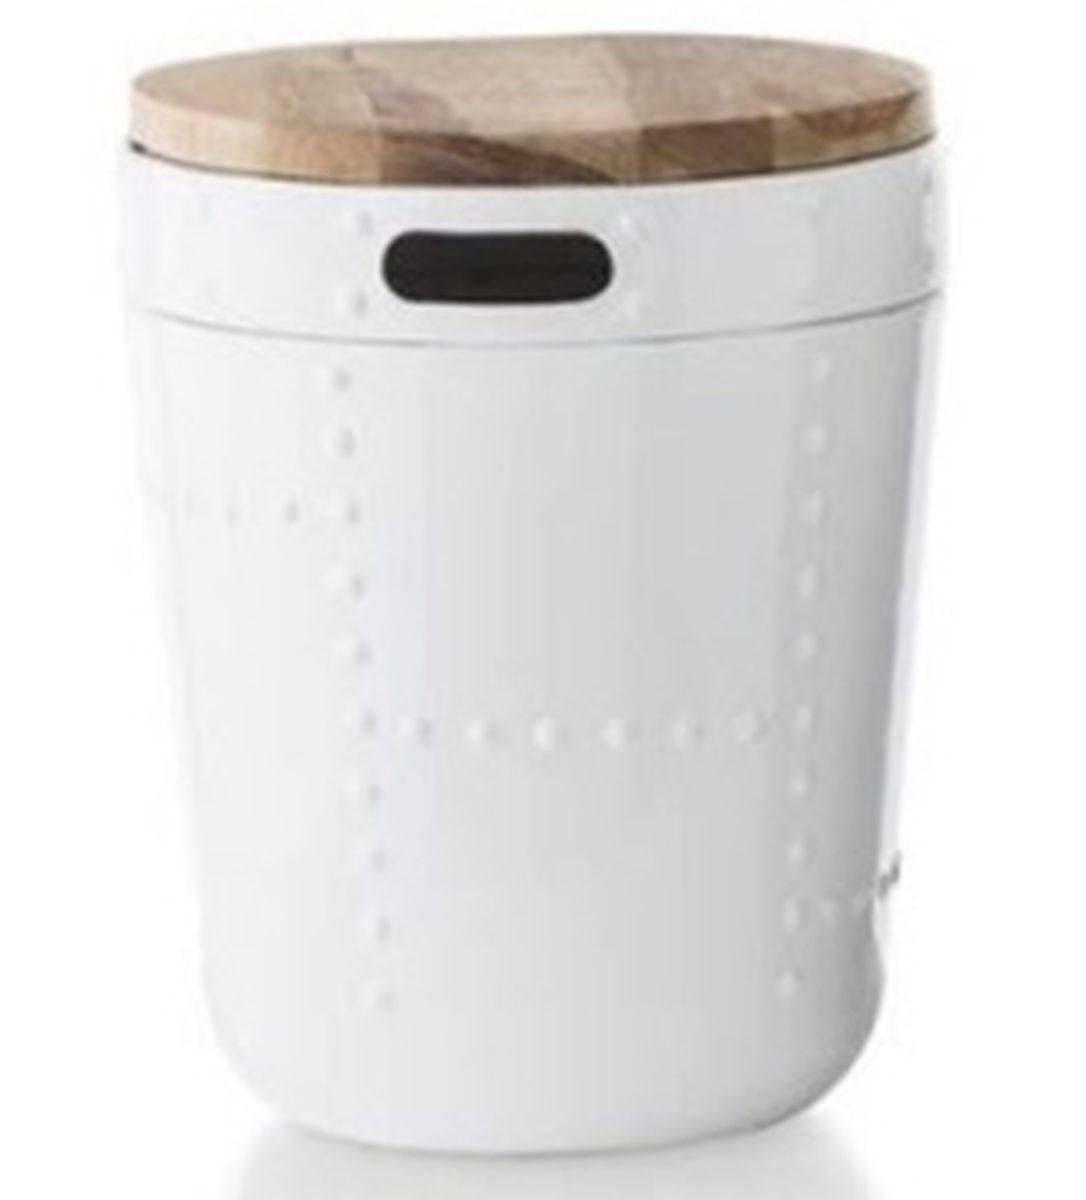 Odkládací stolek Tromble, 33 cm, dřevo/bílá